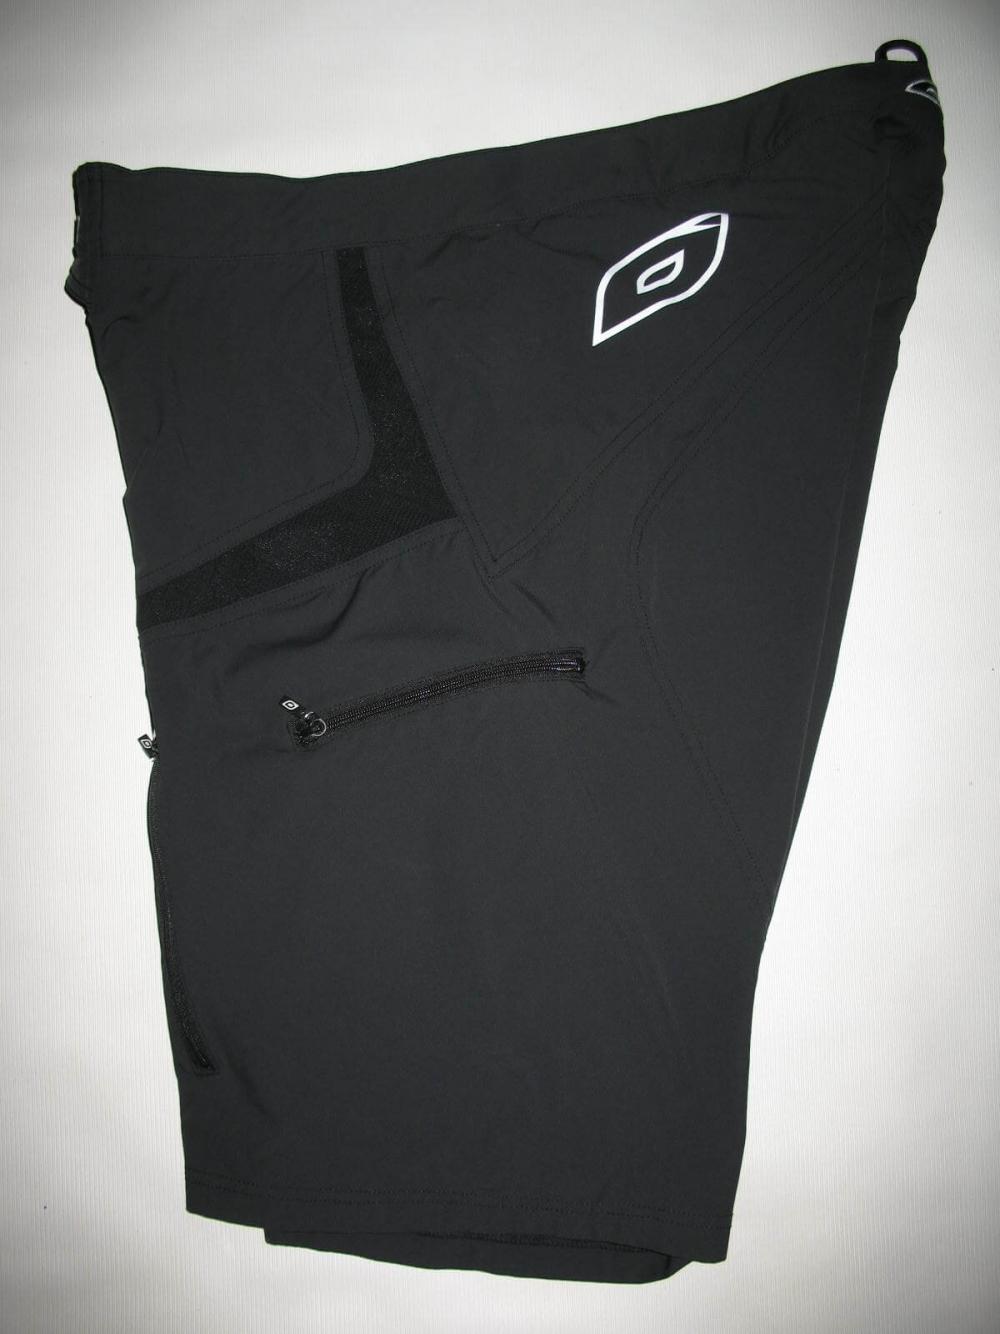 Шорты O'NEAL pin it bike shorts (размер 38-54-XL/XXL) - 2